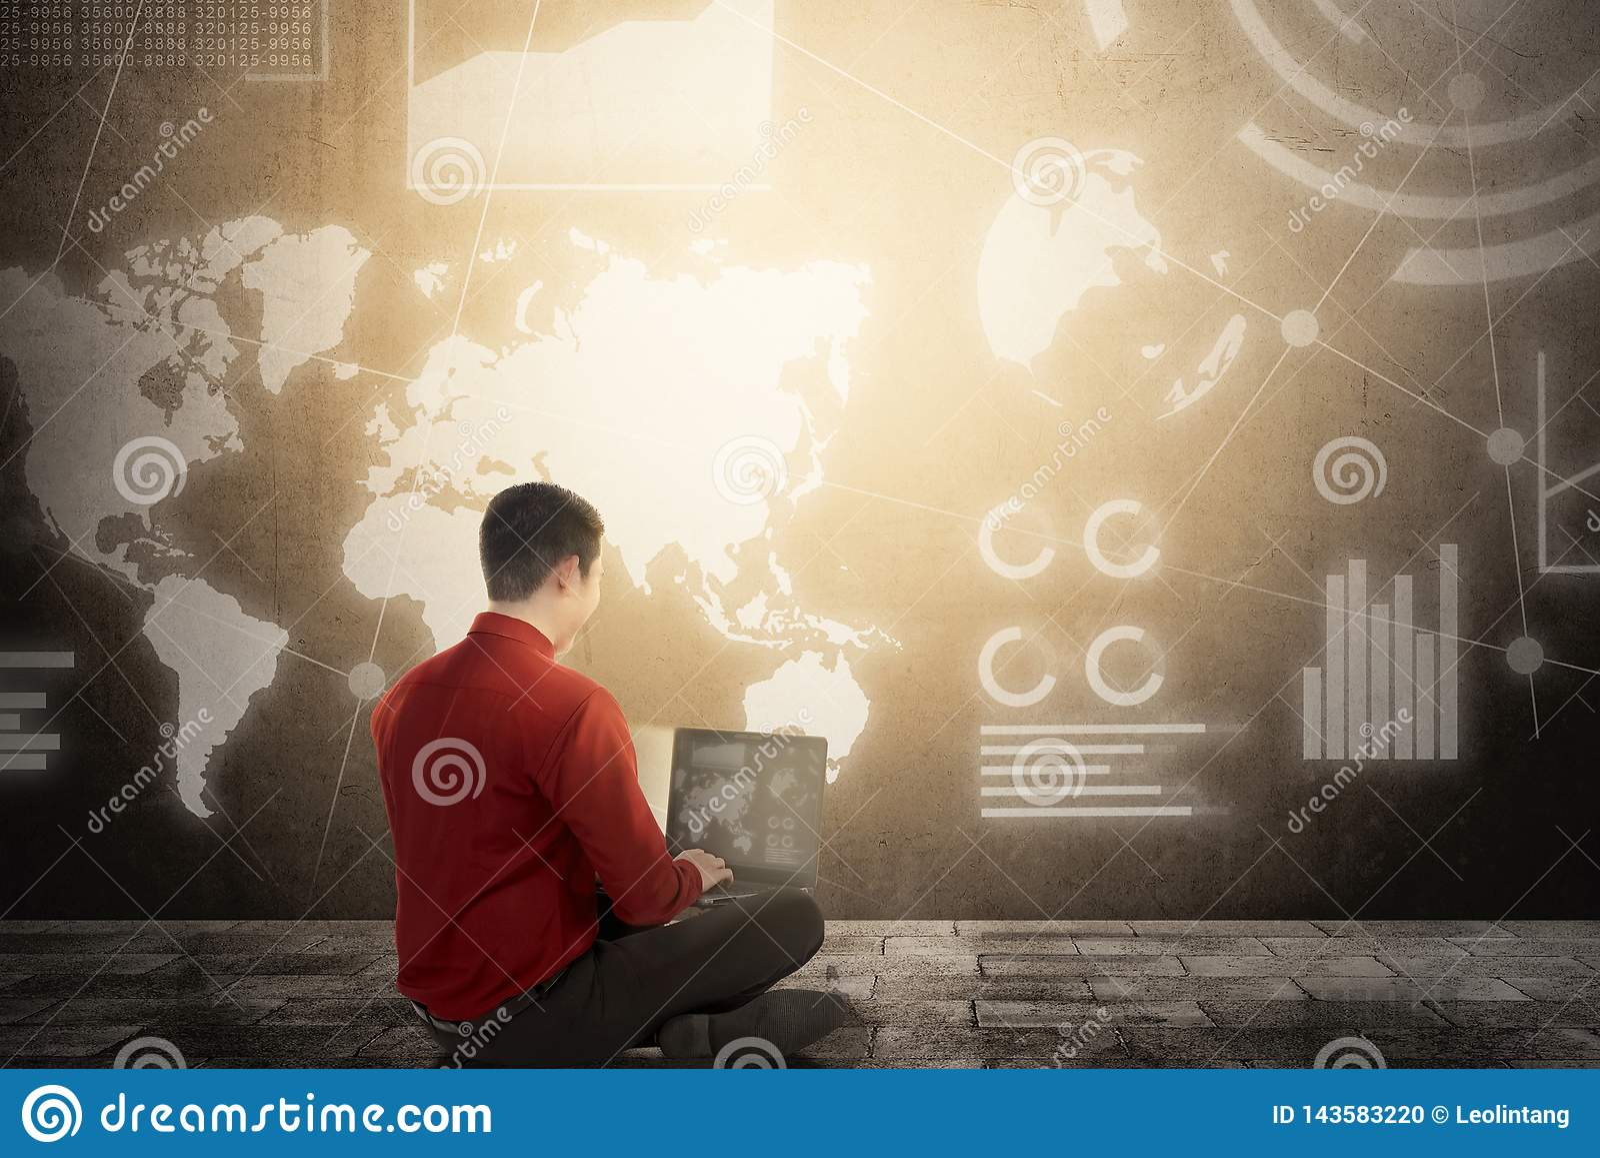 Digital technology concept